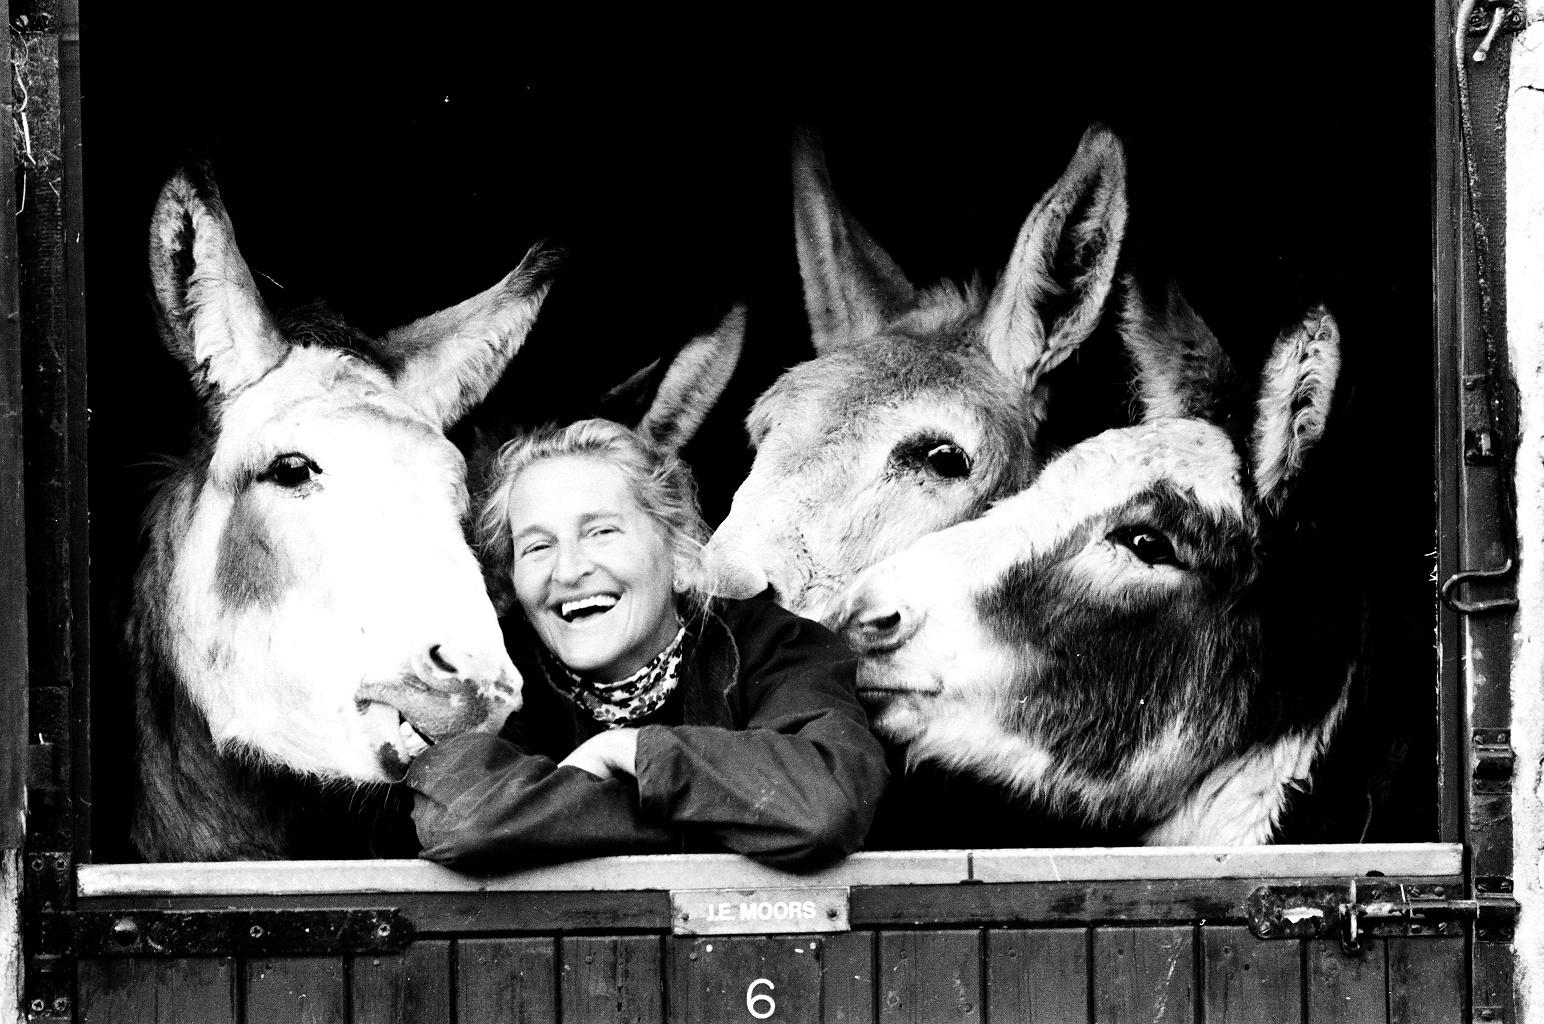 Dr Svendsen with donkeys in 1986 - The Donkey Sanctuary.jpg